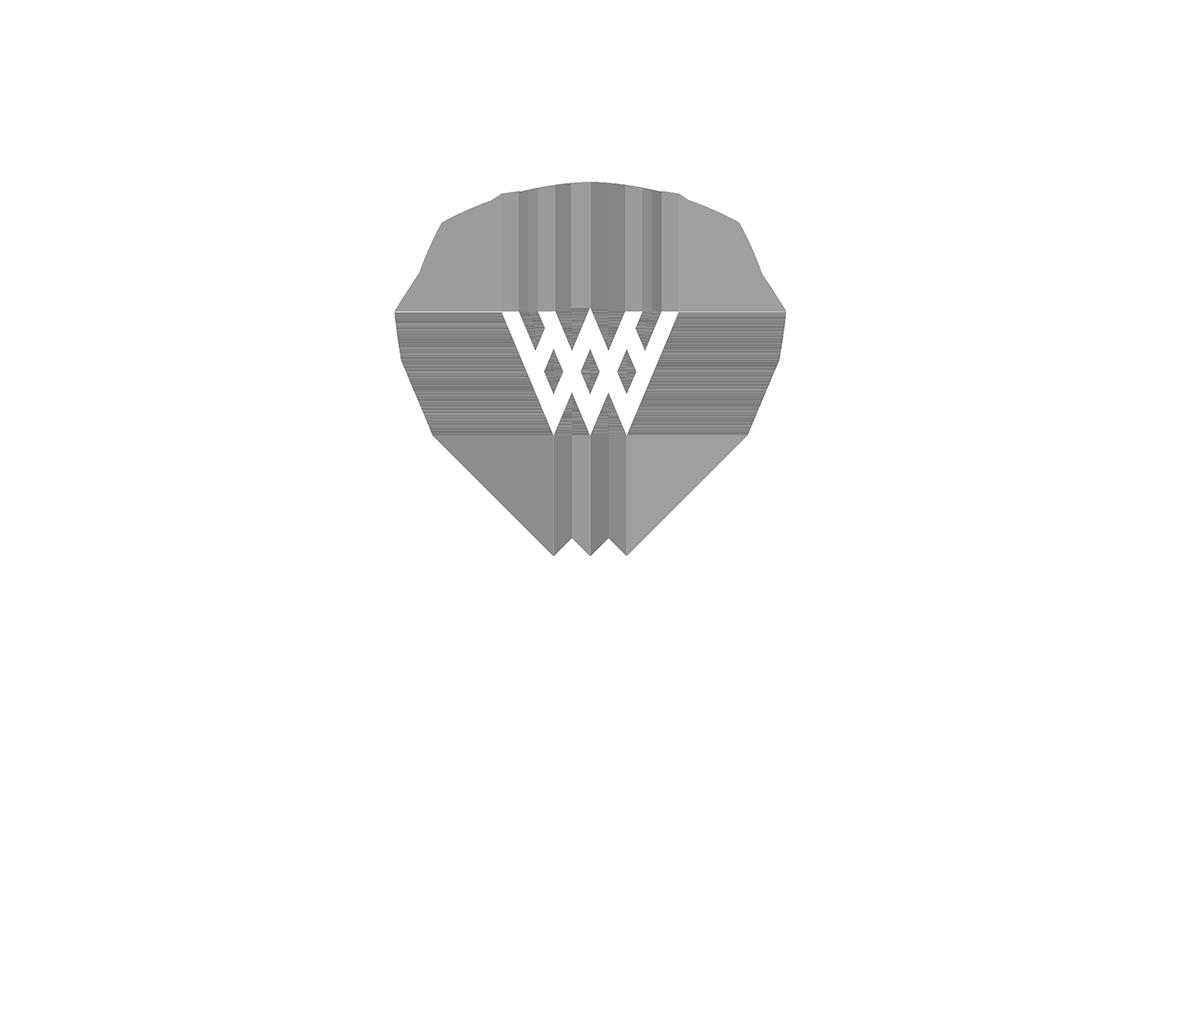 WECOMEINPEACE